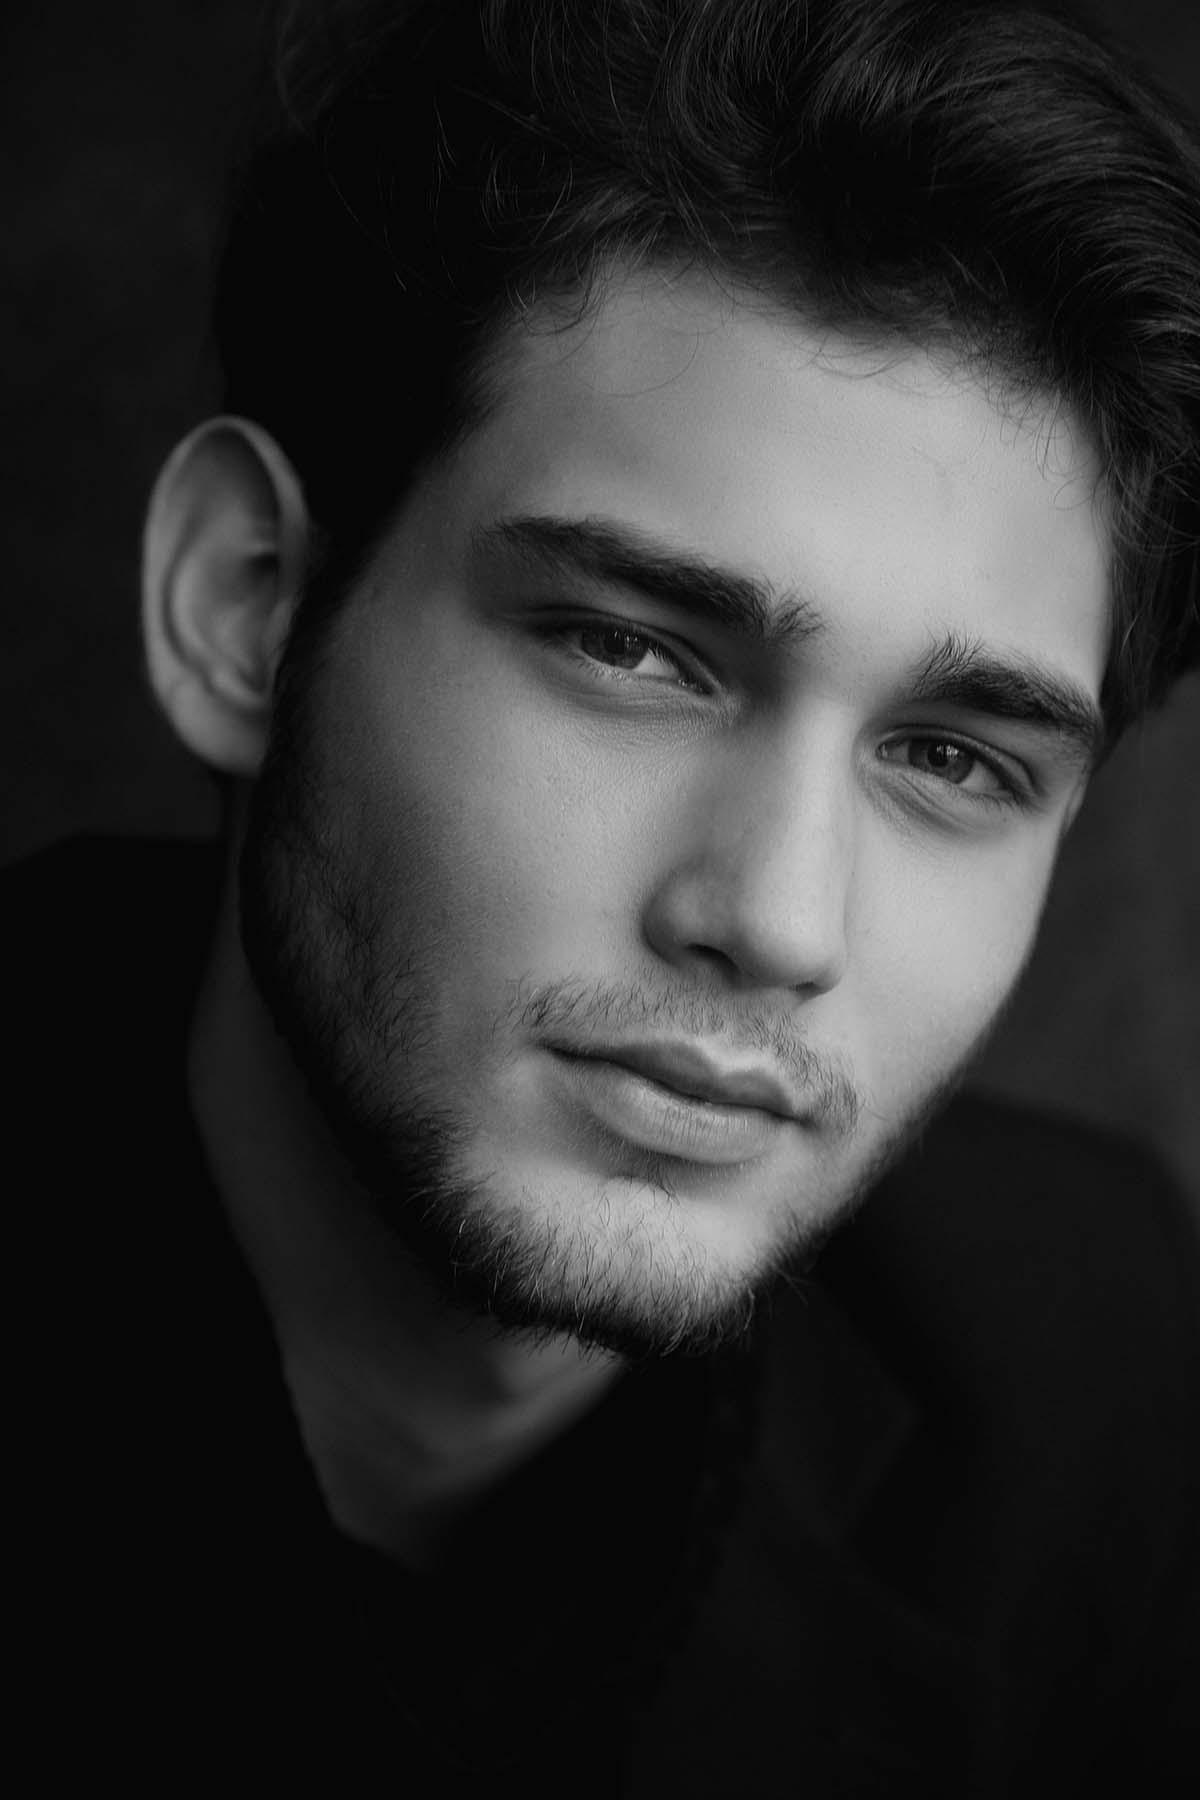 Pedro Arrais by Moises Almeida for Brazilian Male Model